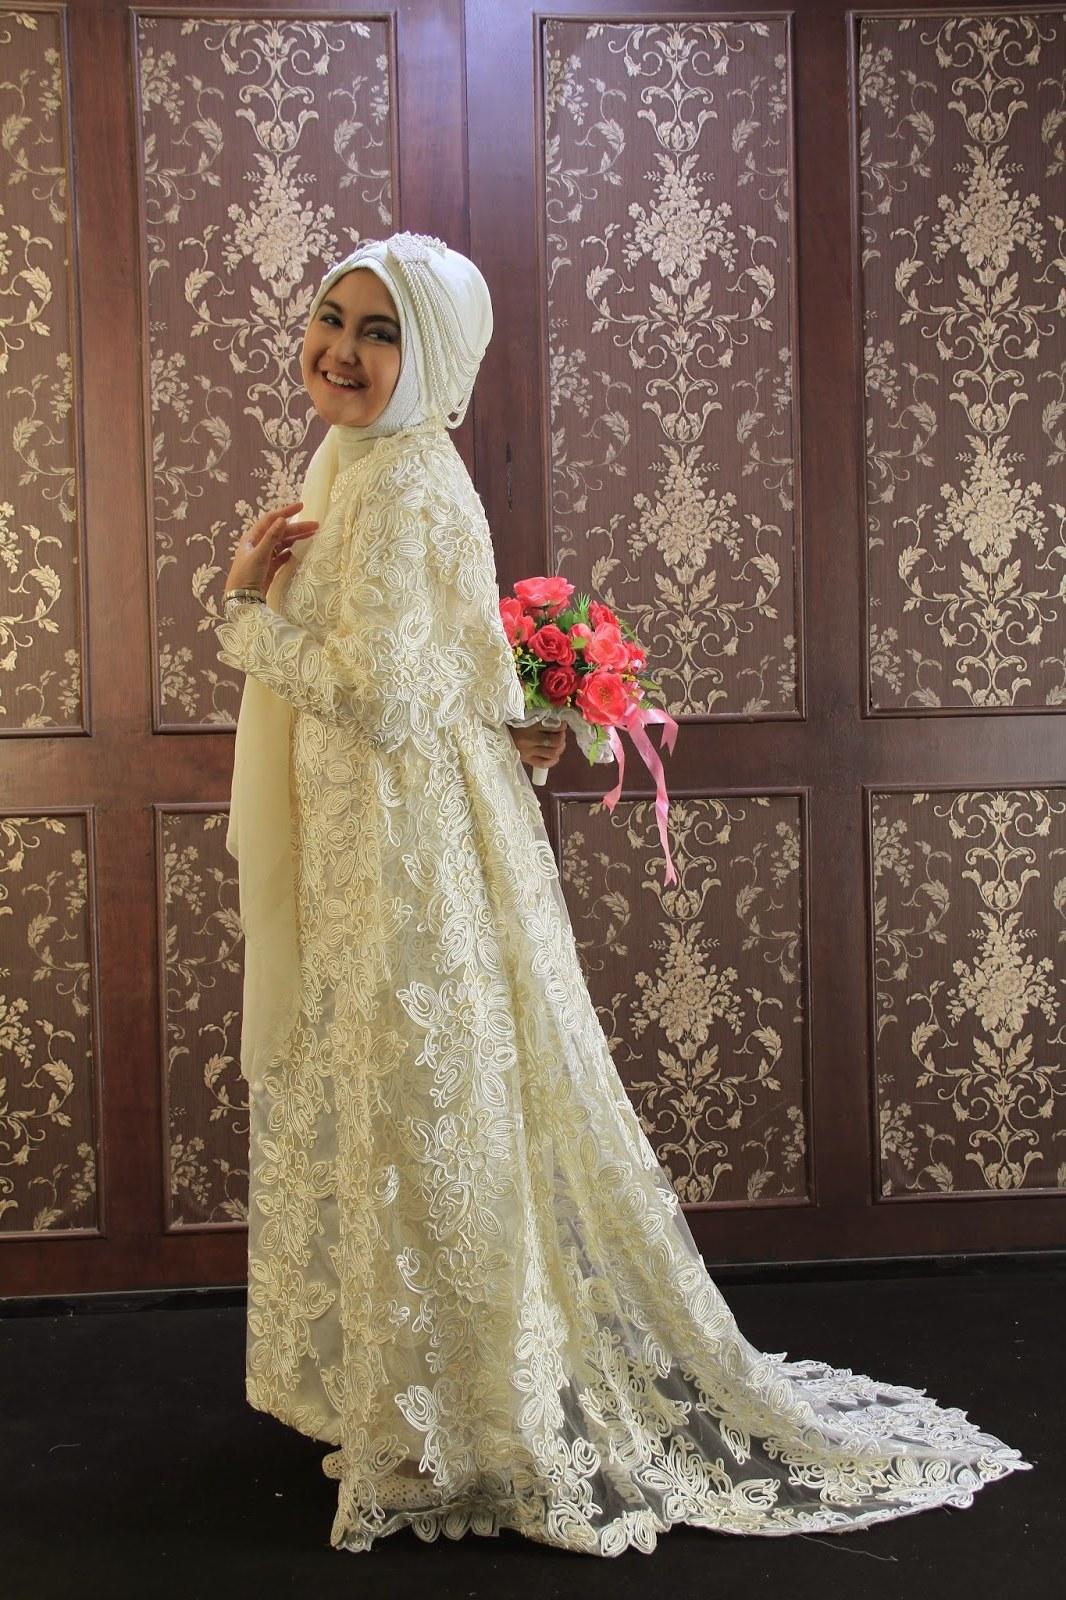 Model Gaun Pengantin Muslim 2017 Whdr Padme Wedding Dress Replica – Fashion Dresses